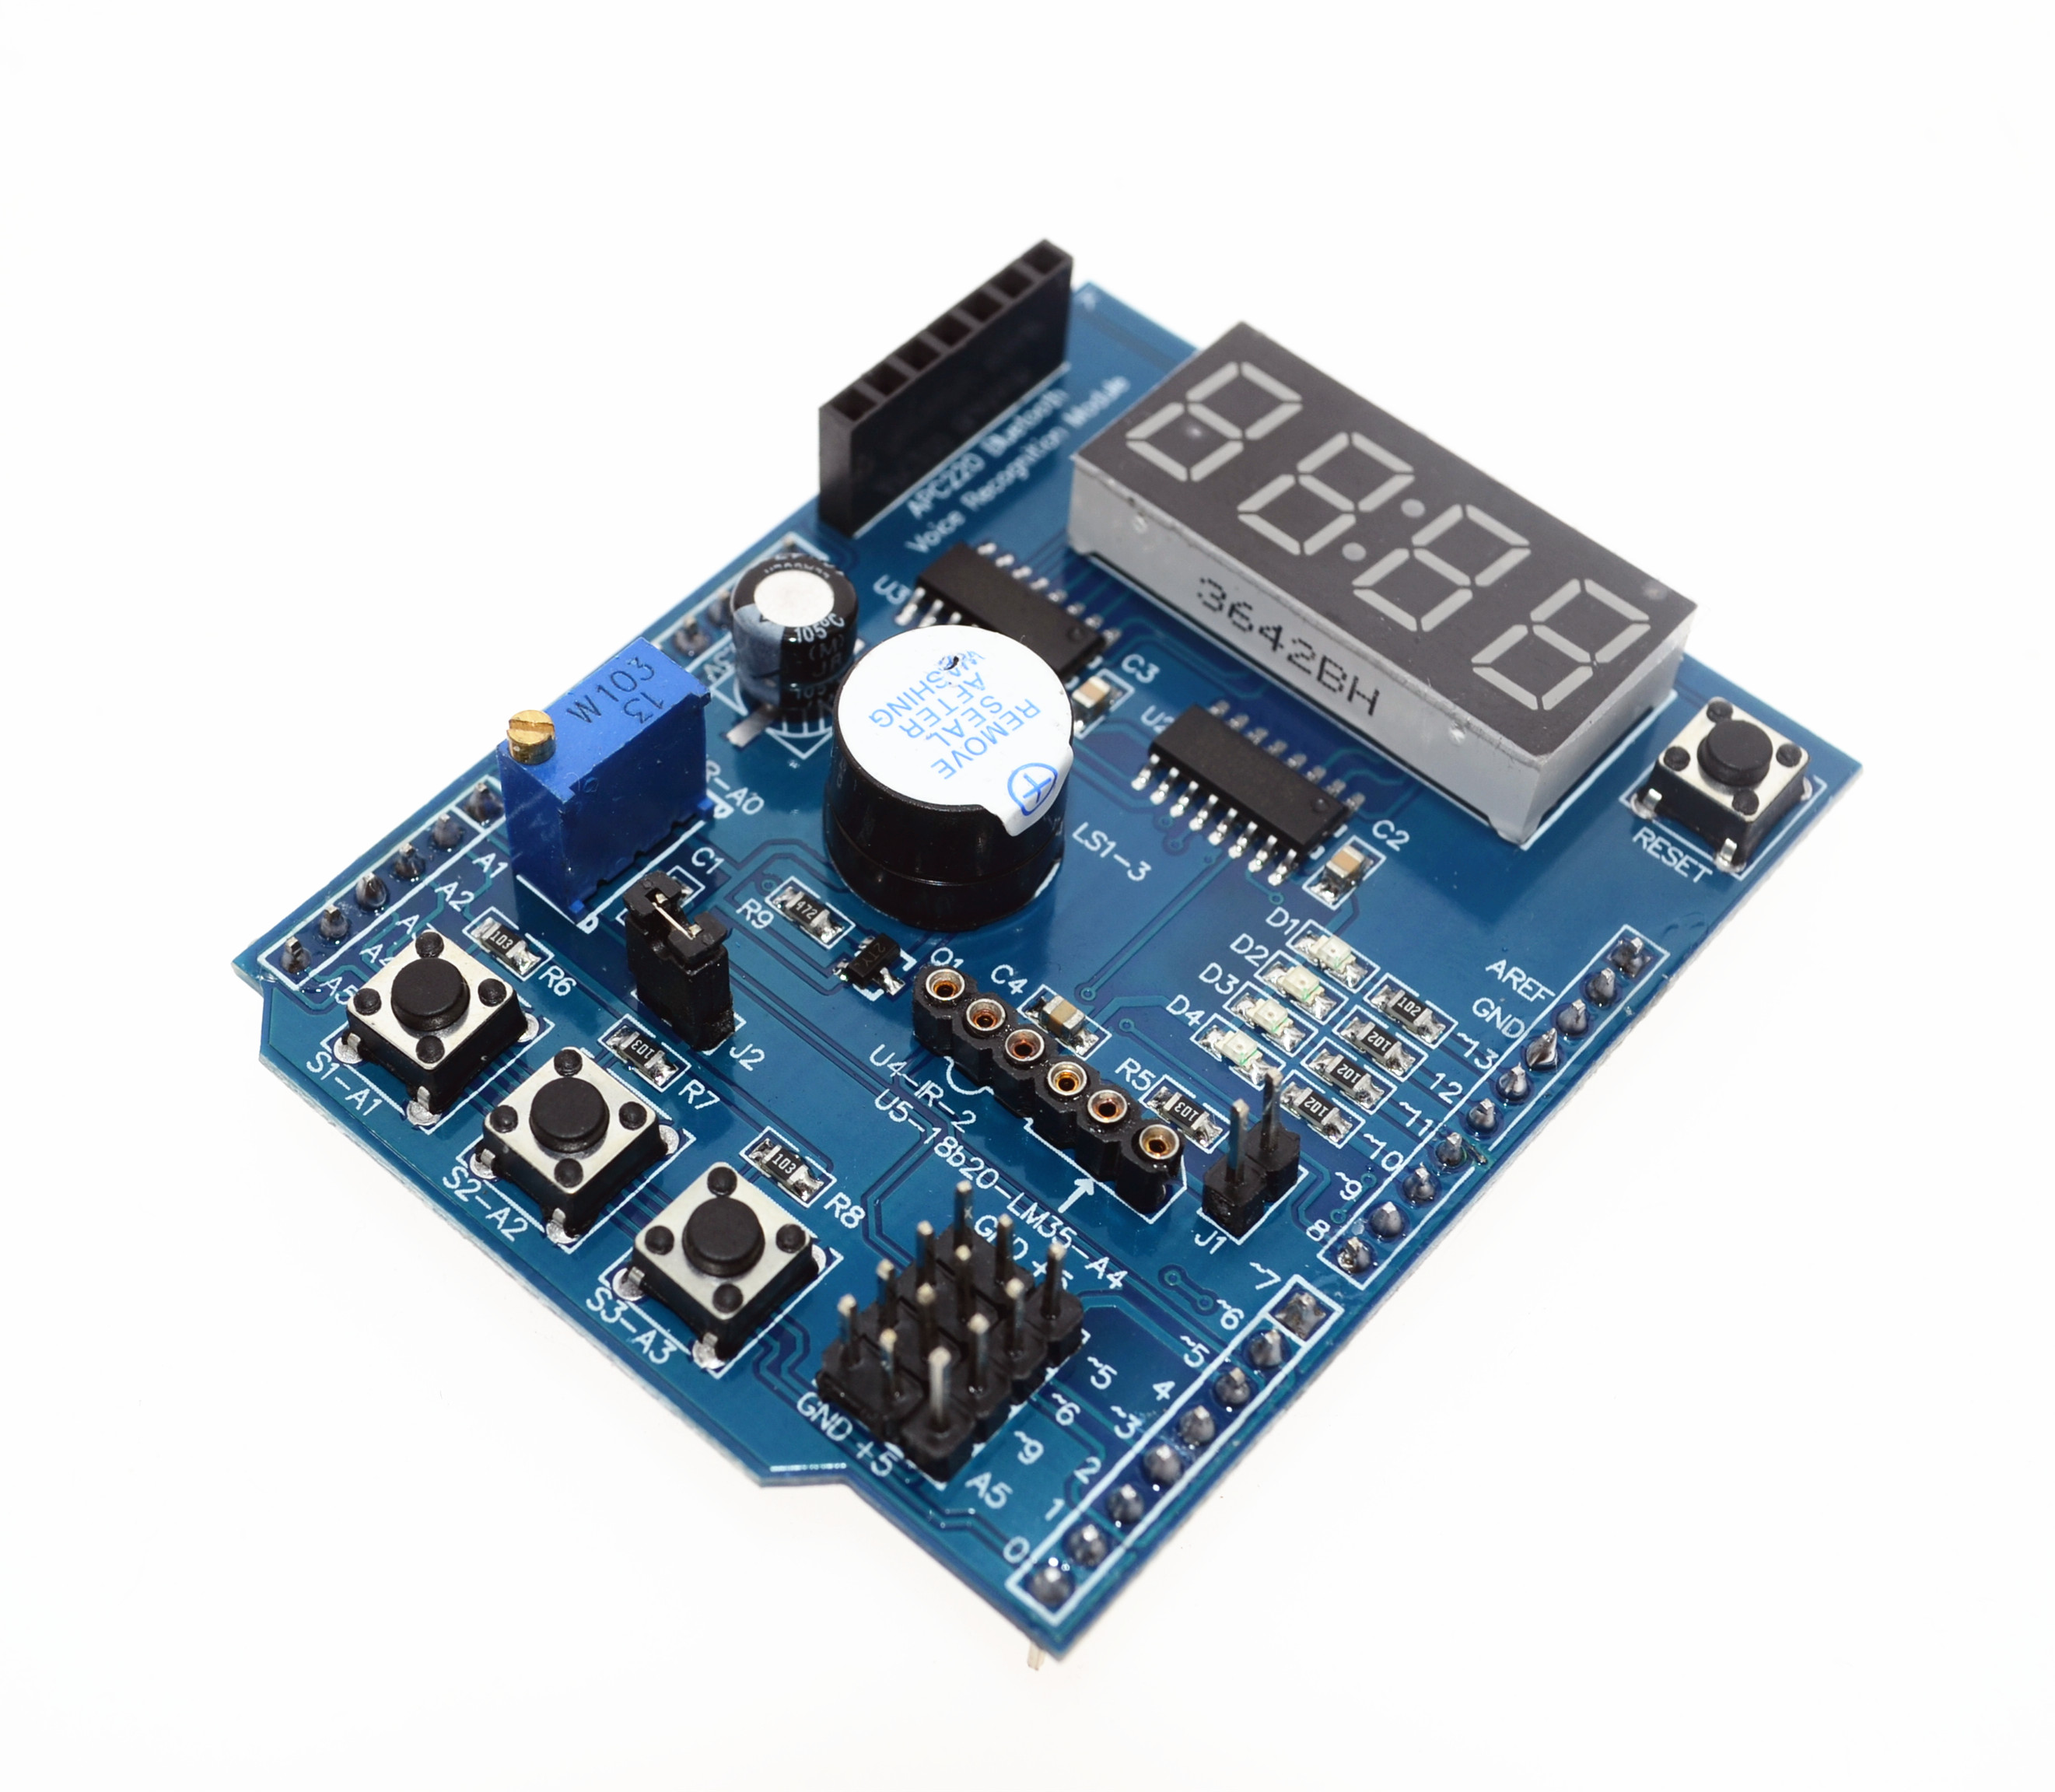 1pcs for Arduino Multifunctional Multi functional Expansion Development Board Base Learning UNO LENARDO Mega 2560 Shield